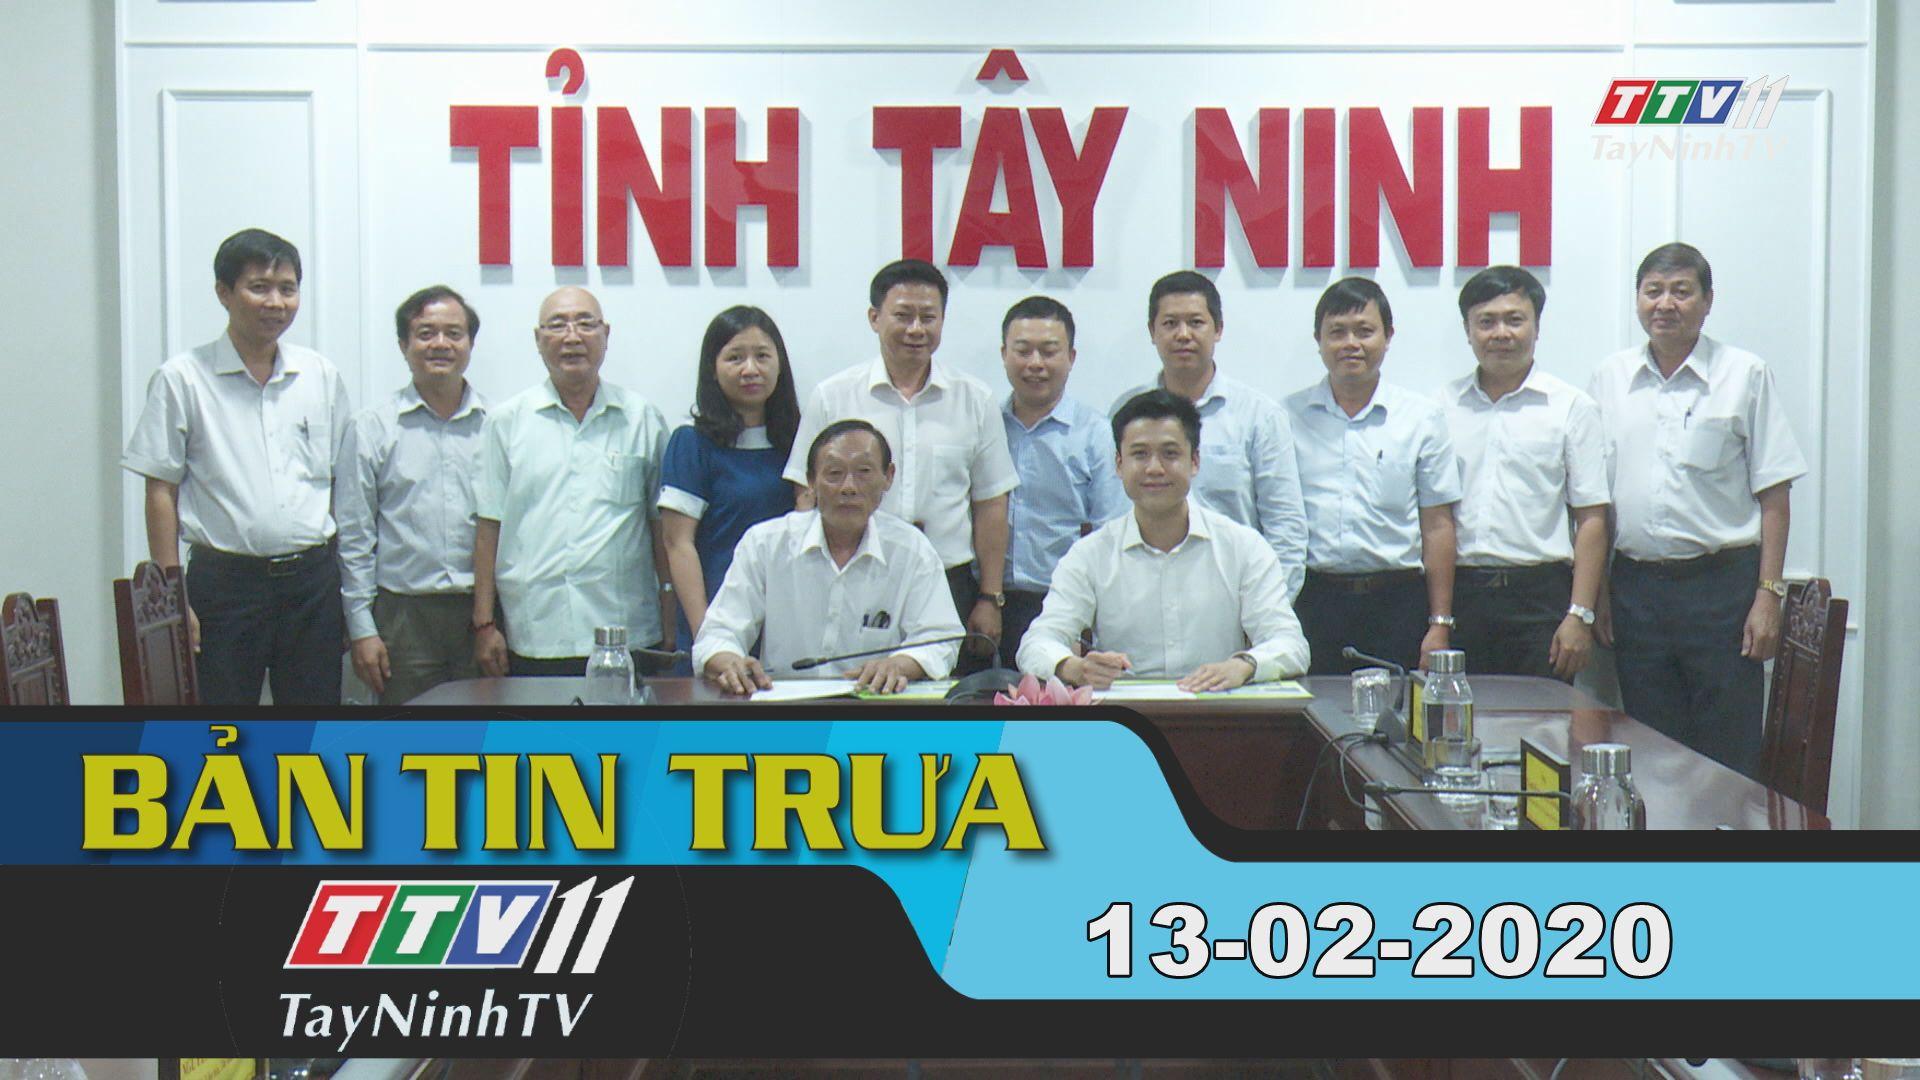 Bản tin trưa 13-02-2020 | Tin tức hôm nay | TayNinhTV